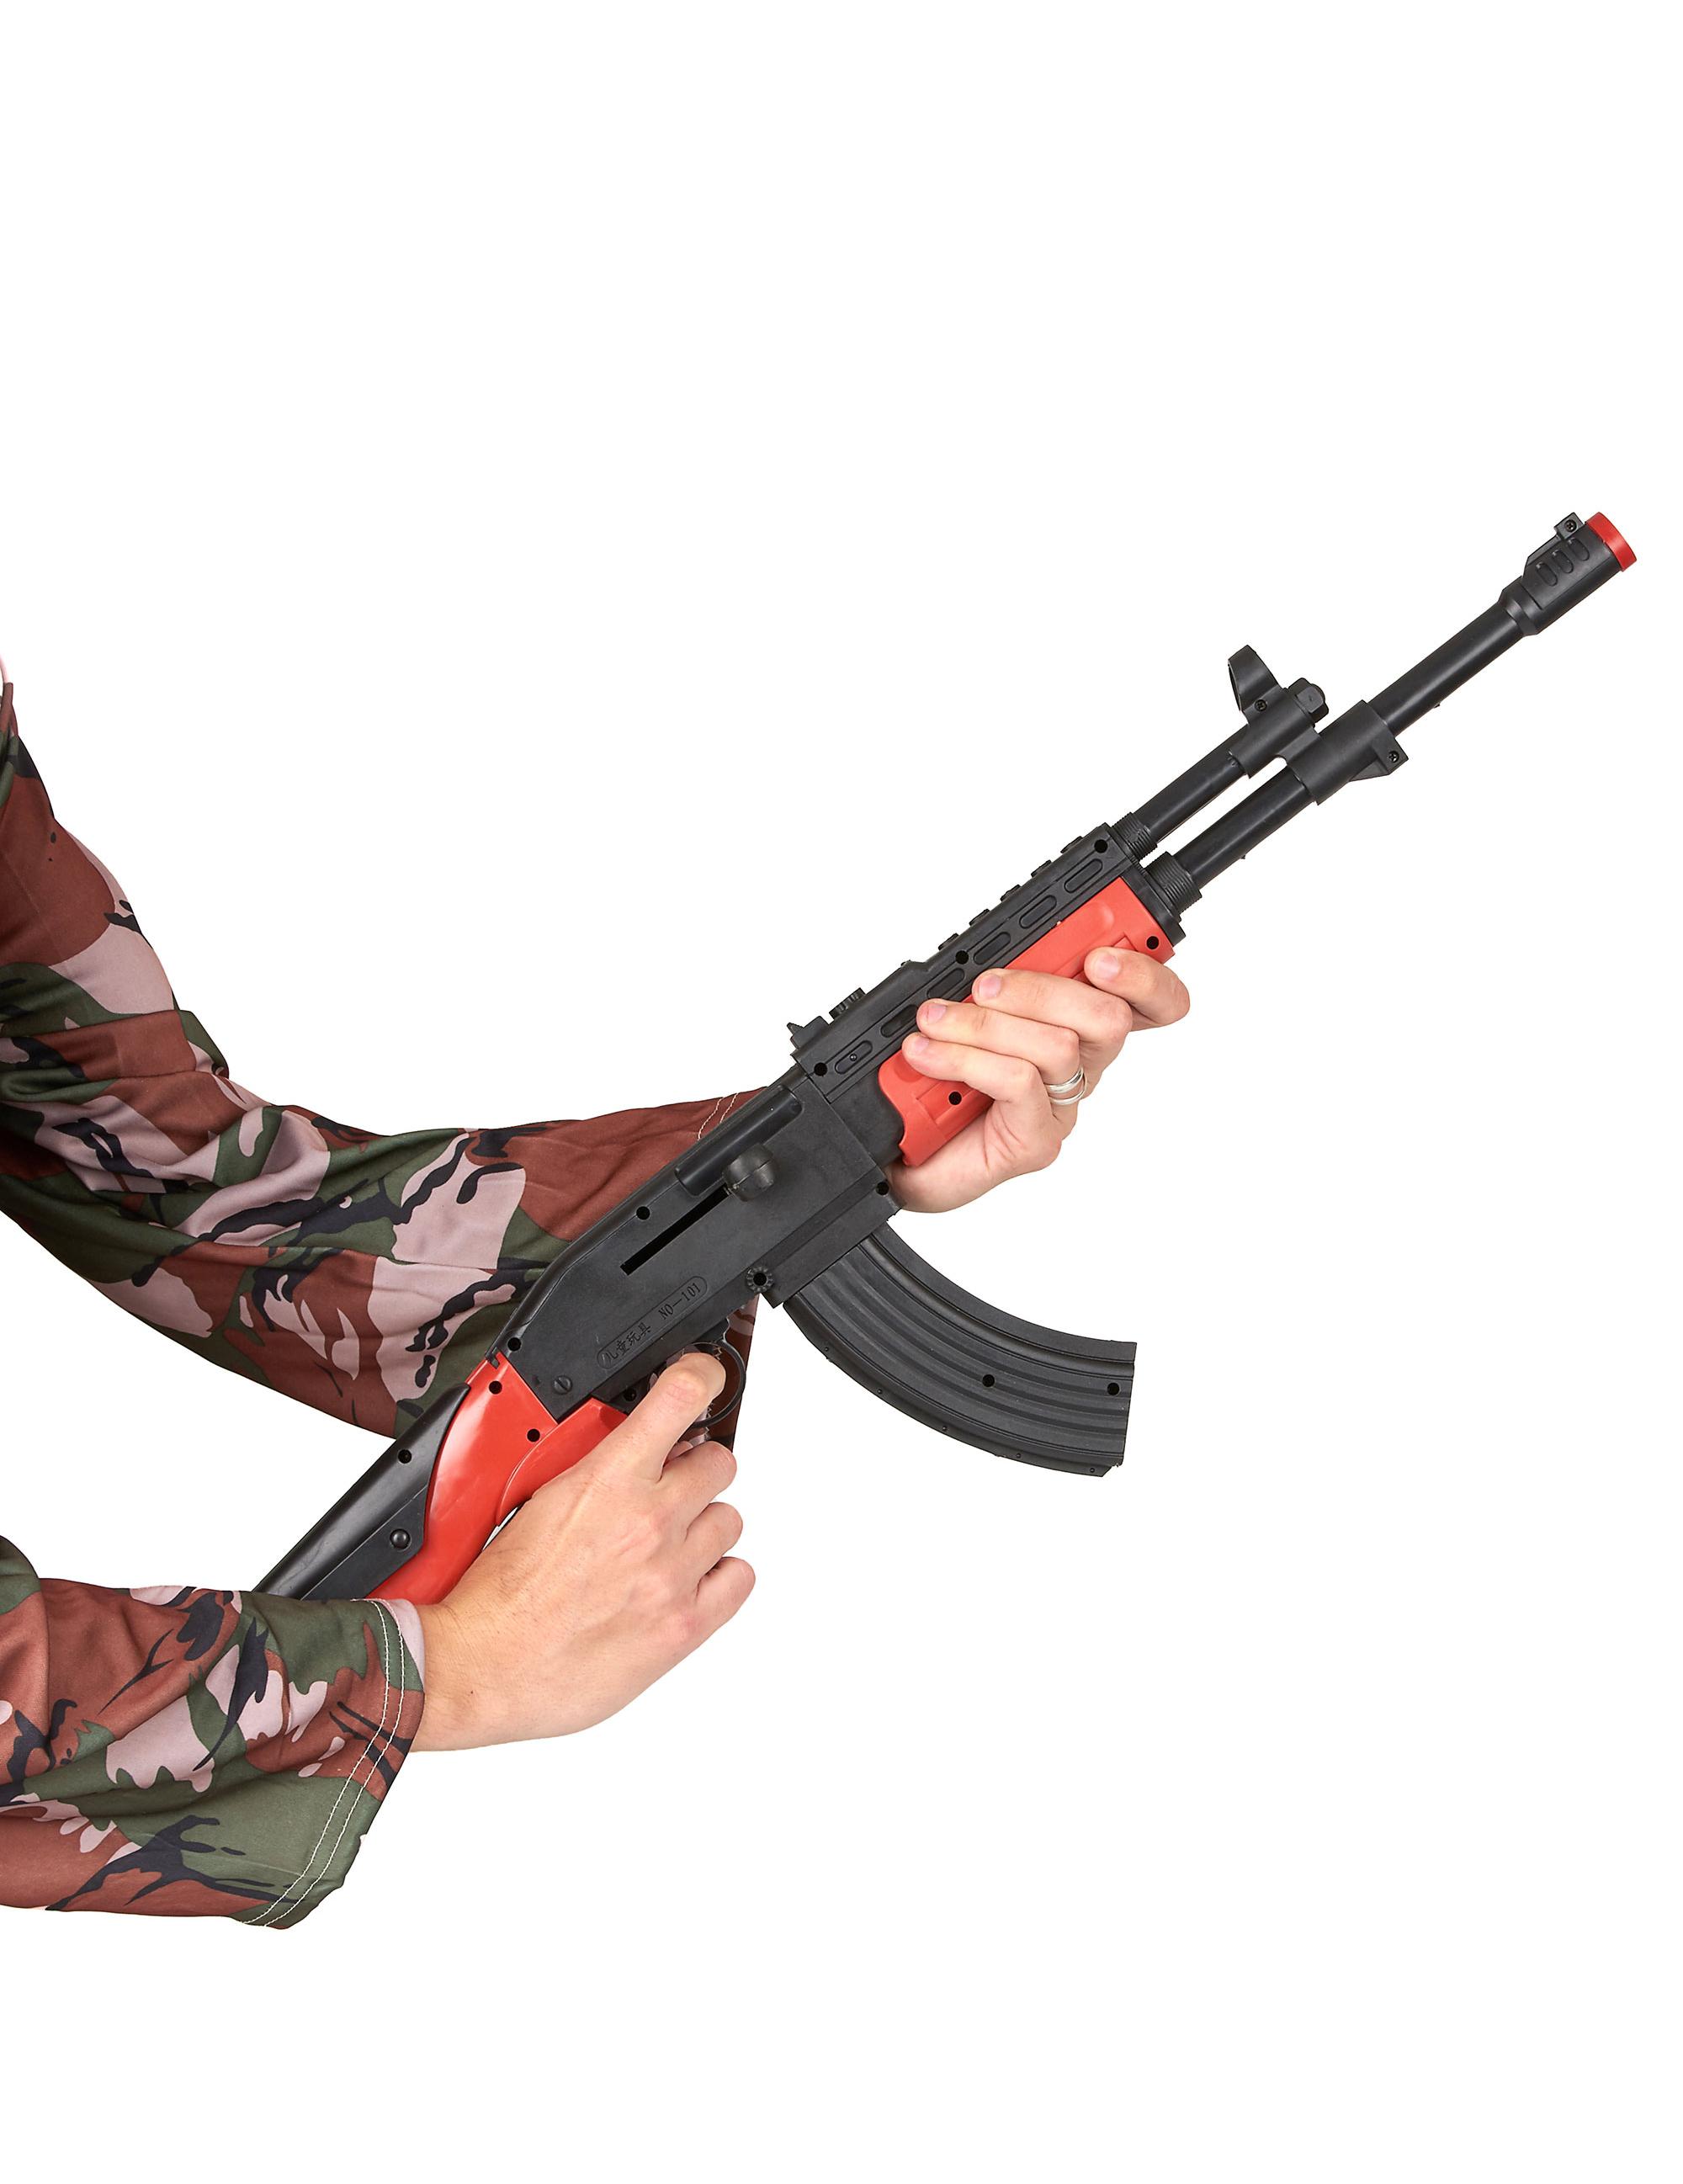 Kalachnikov de soldat en plastique adulte Cod.2466